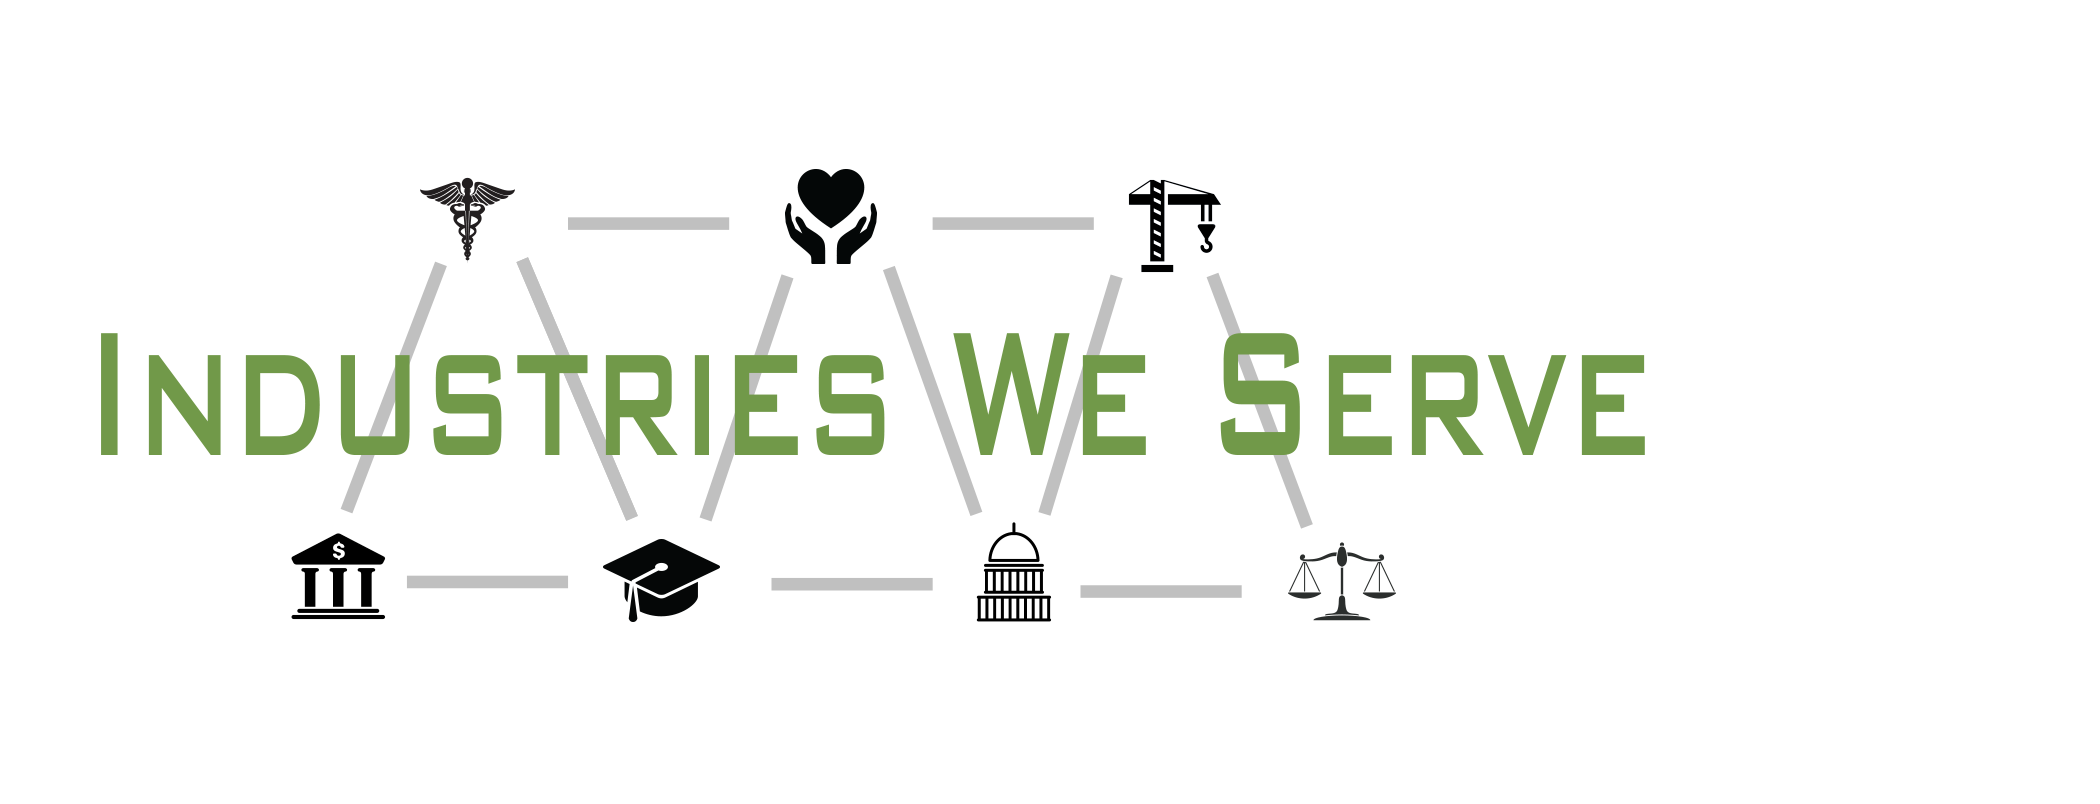 Industries We Serve.png